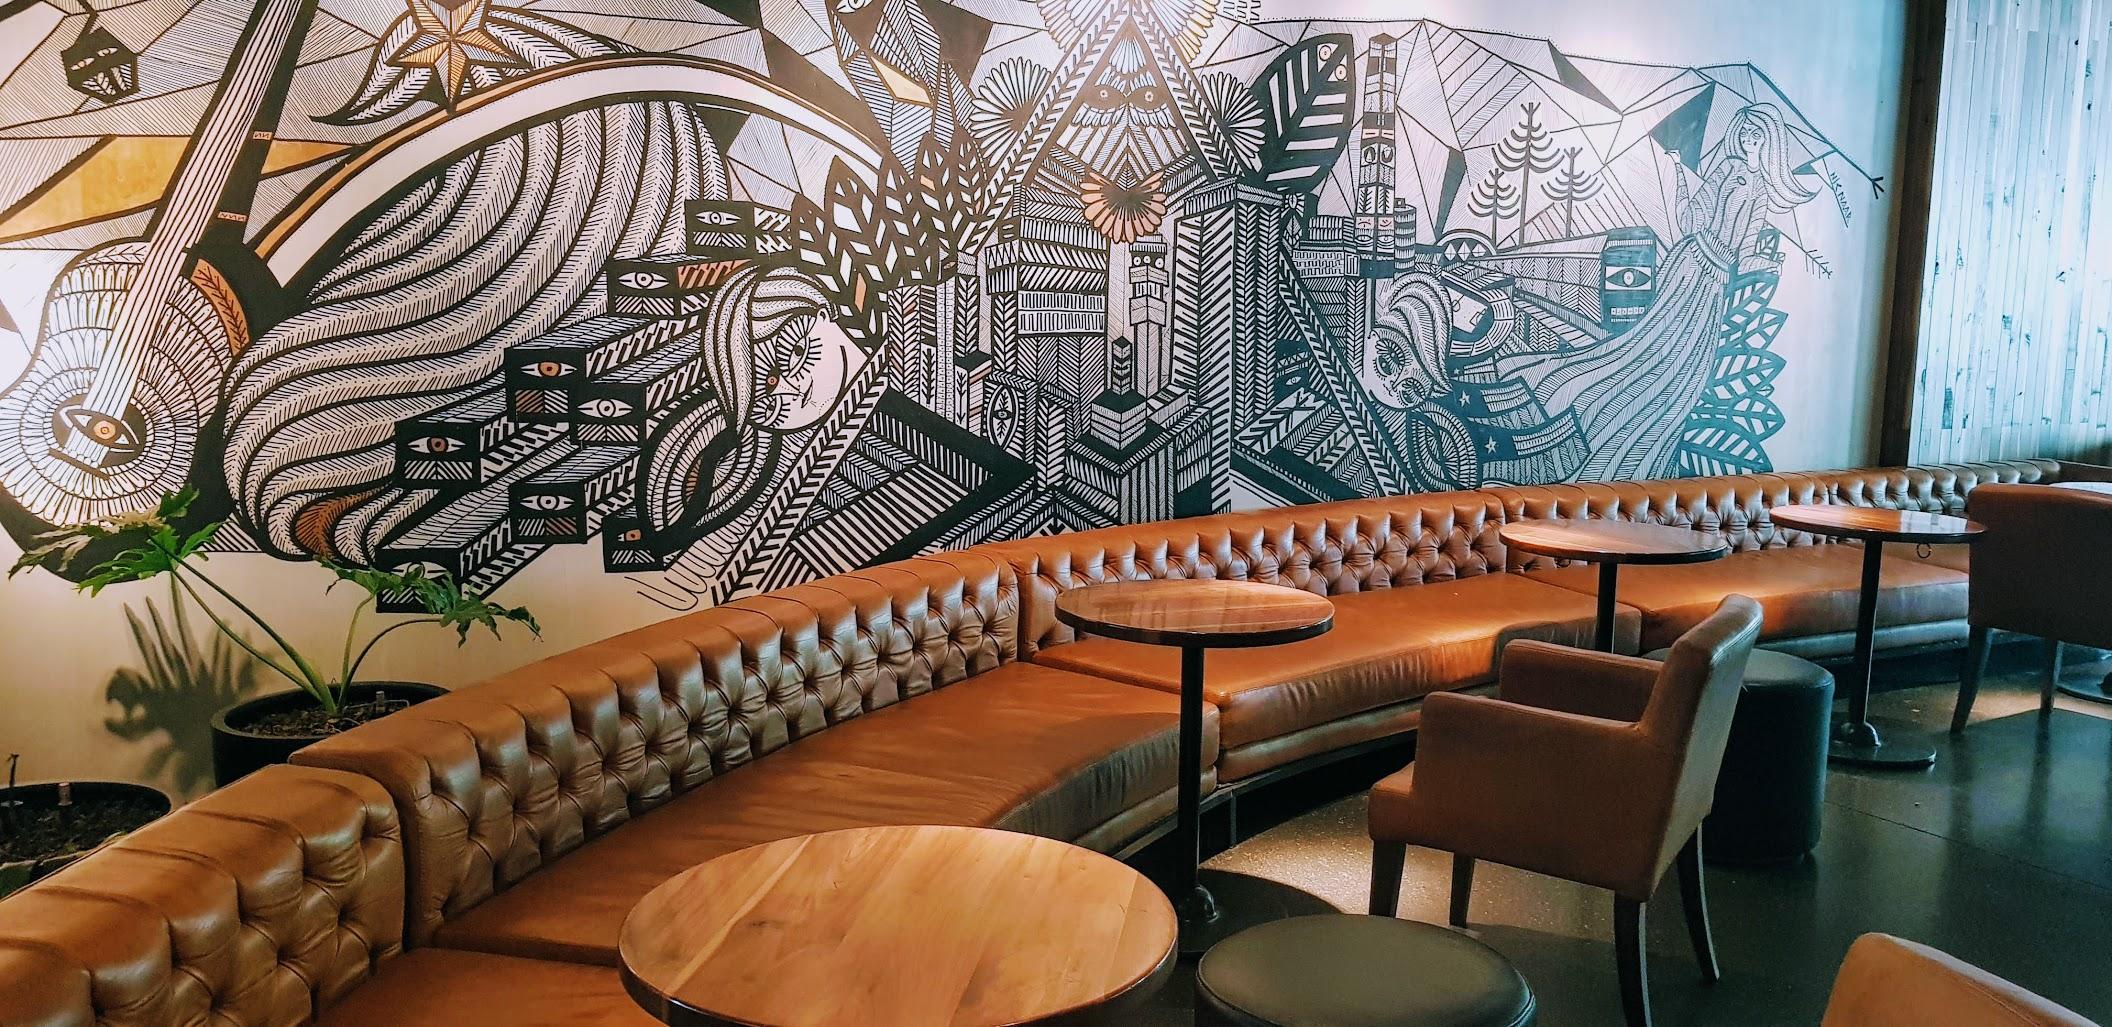 Starbucks Isidora Goyenchenea